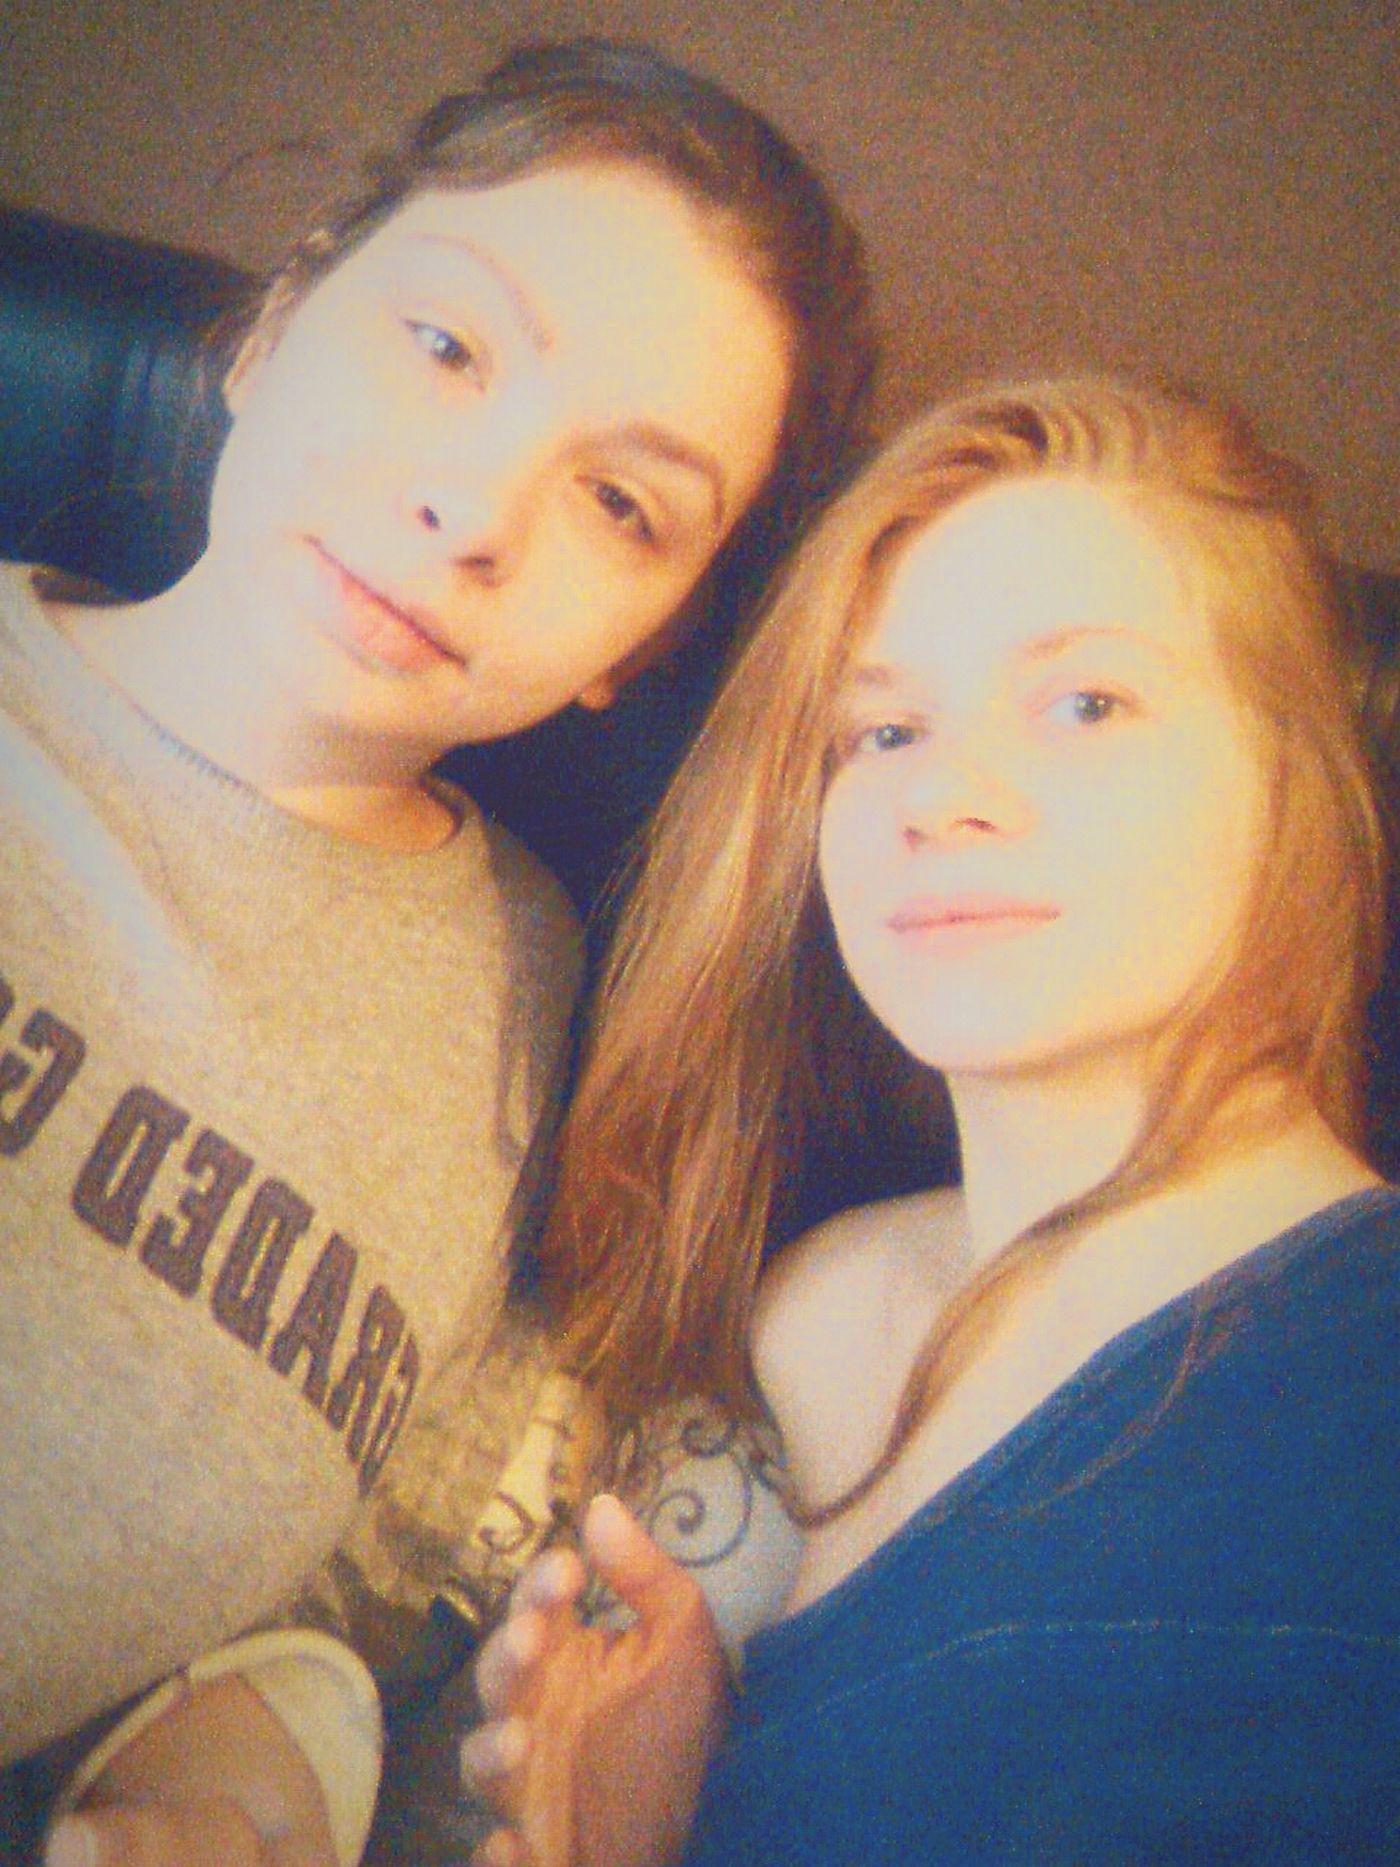 Best Friend Friends ❤